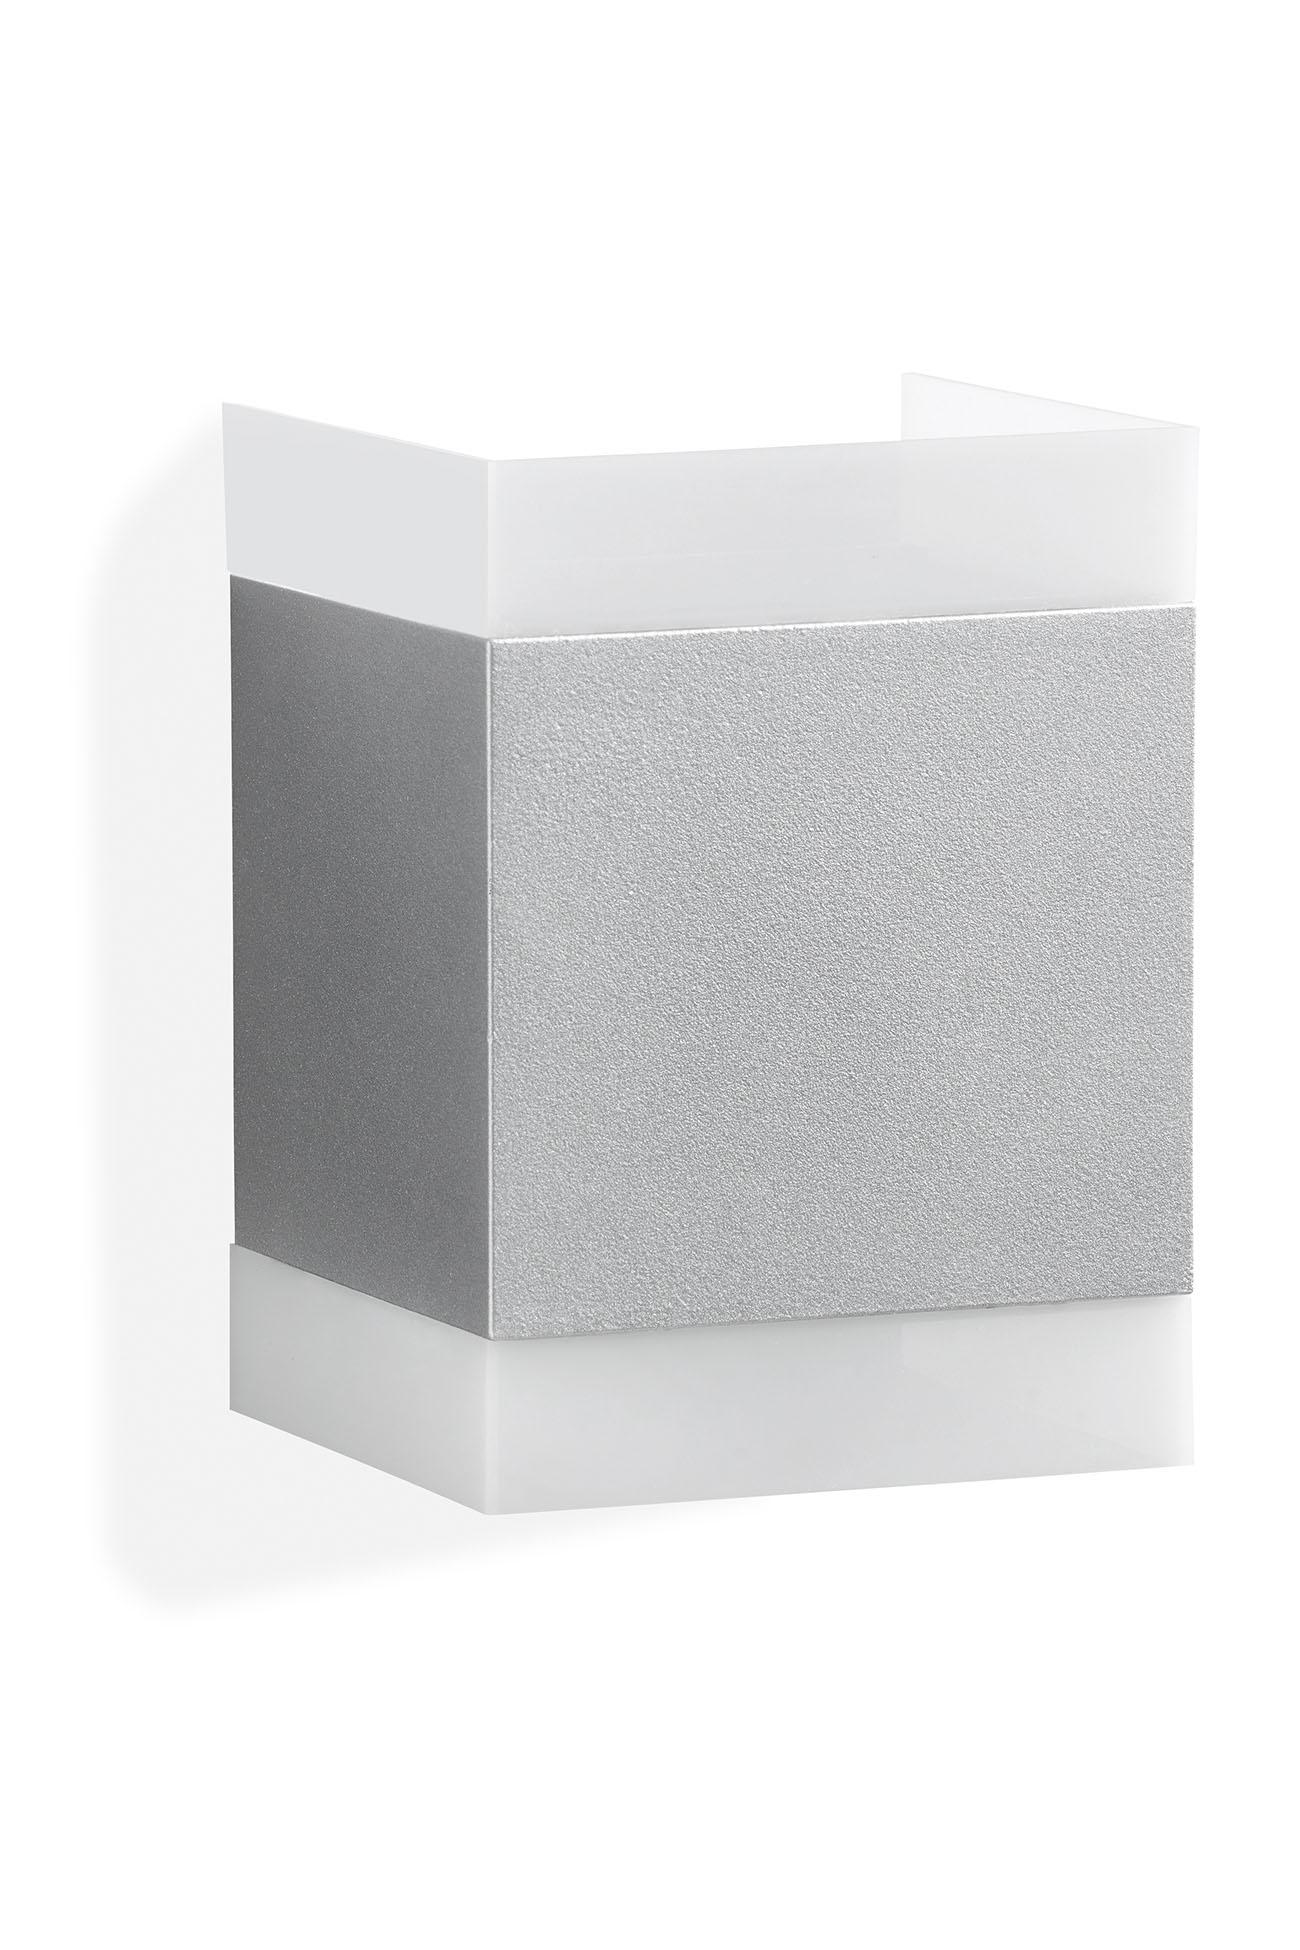 TELEFUNKEN LED Aussenleuchte, 15 cm, 7 W, Silber